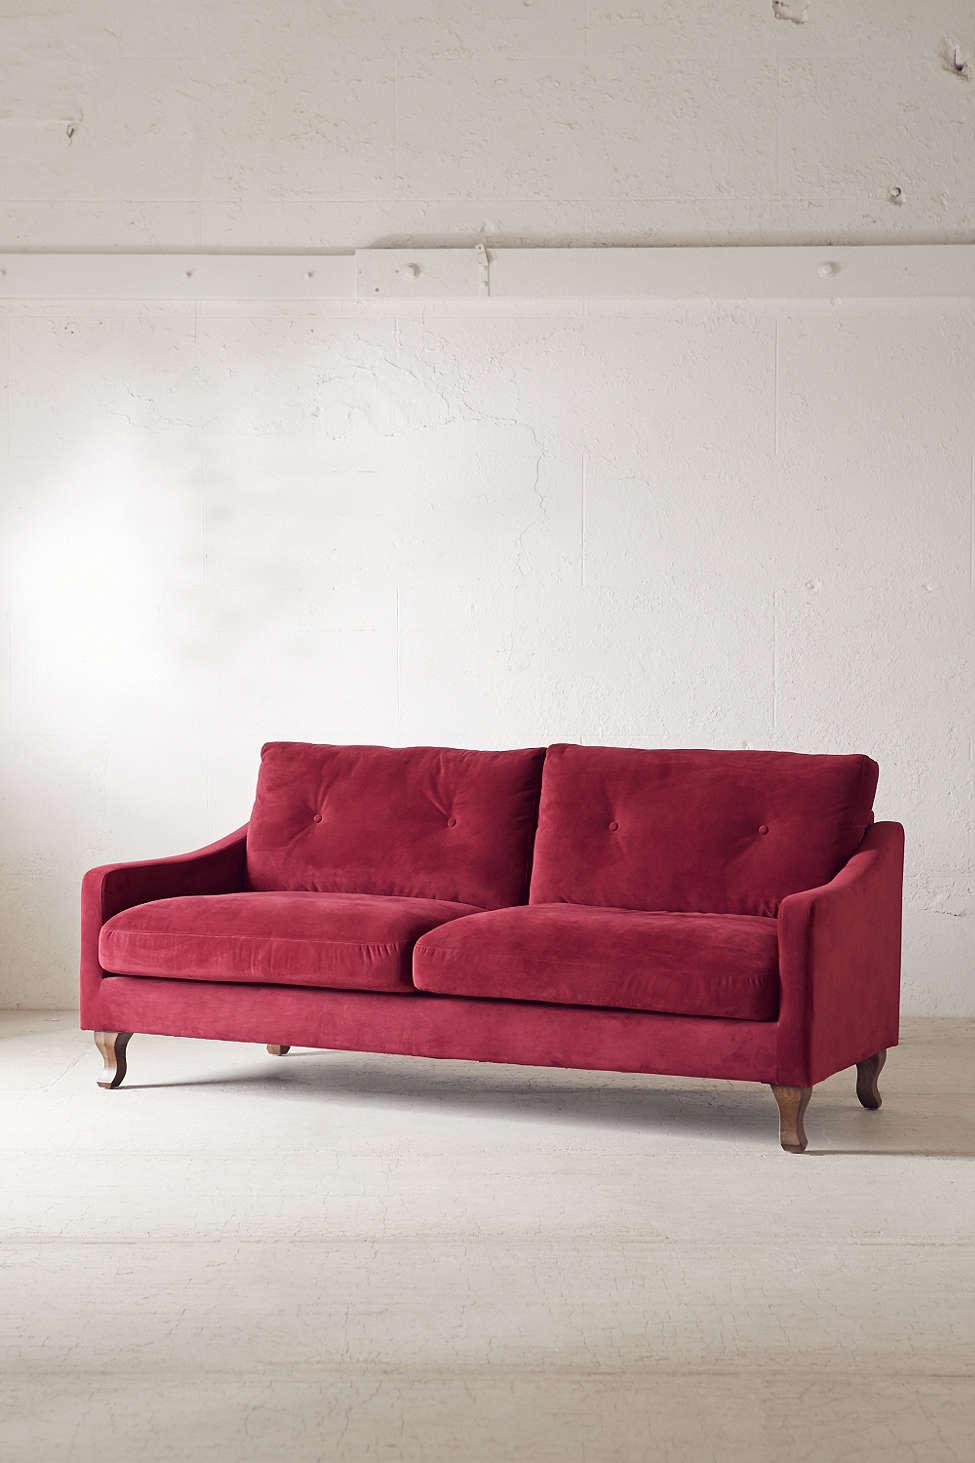 plum-bow-annette-sofa-urban-outfitters.jpg